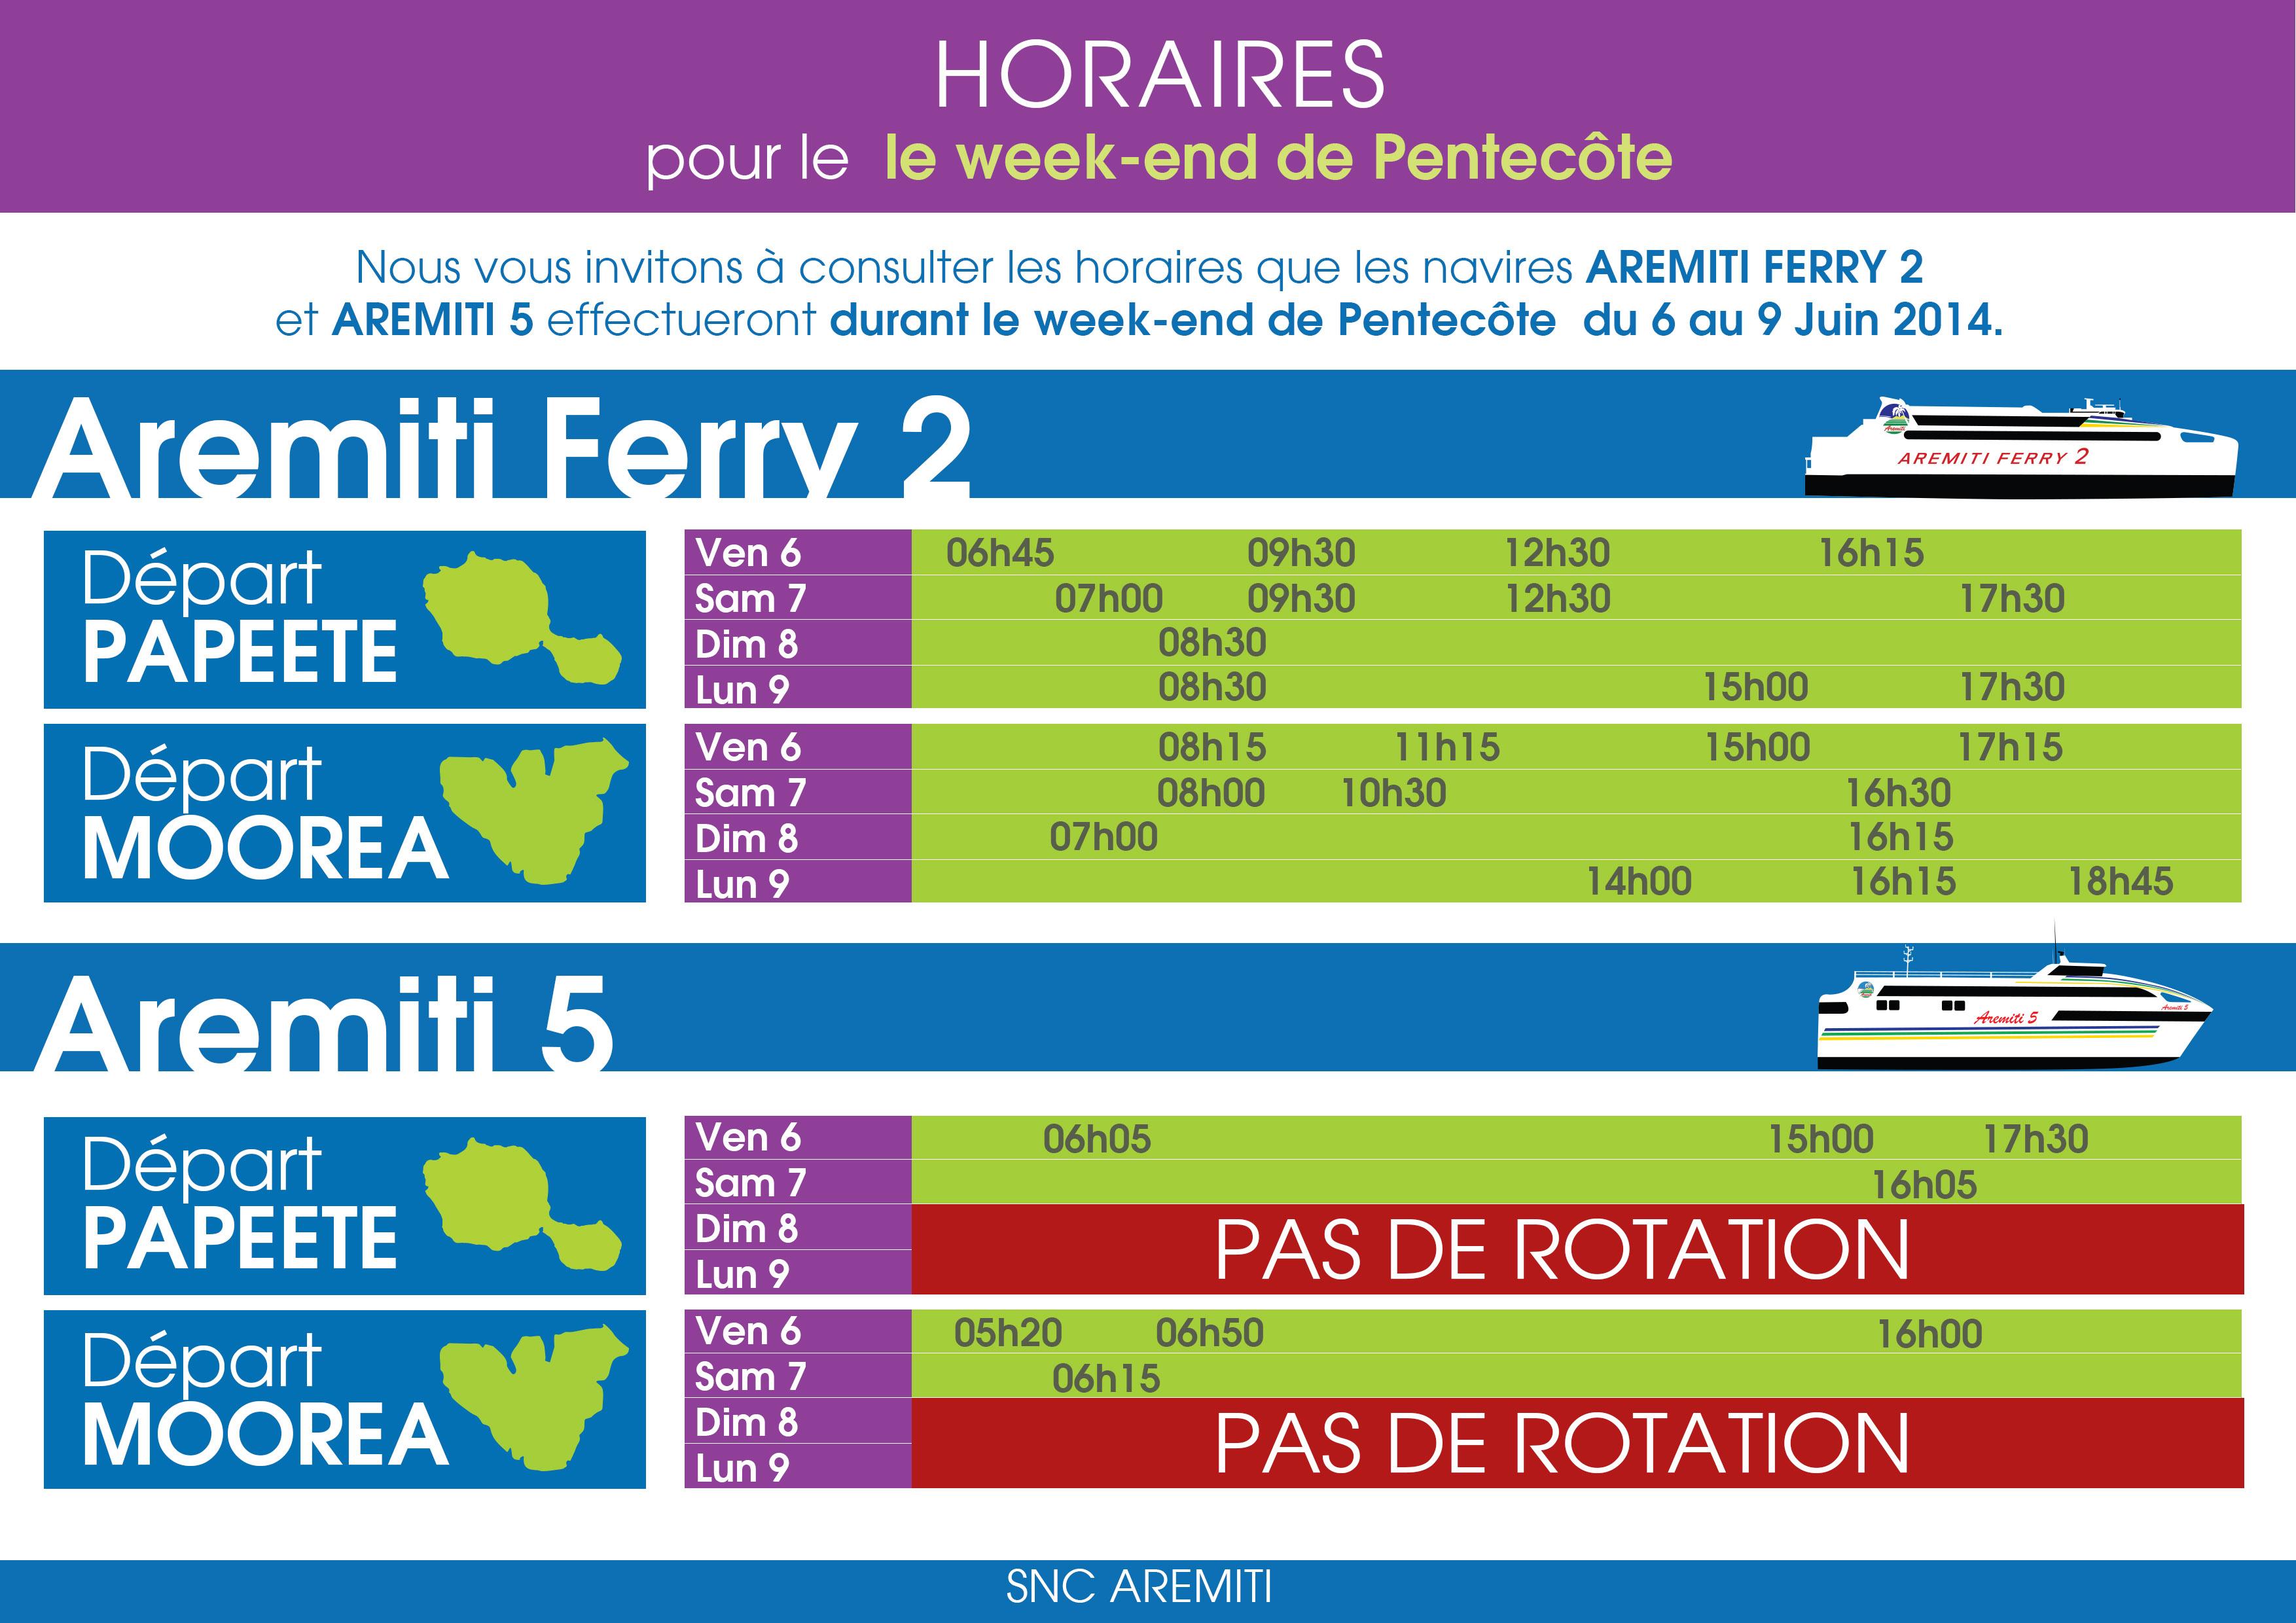 horaires du navire aremiti ferry 2 et aremiti 5 week end. Black Bedroom Furniture Sets. Home Design Ideas